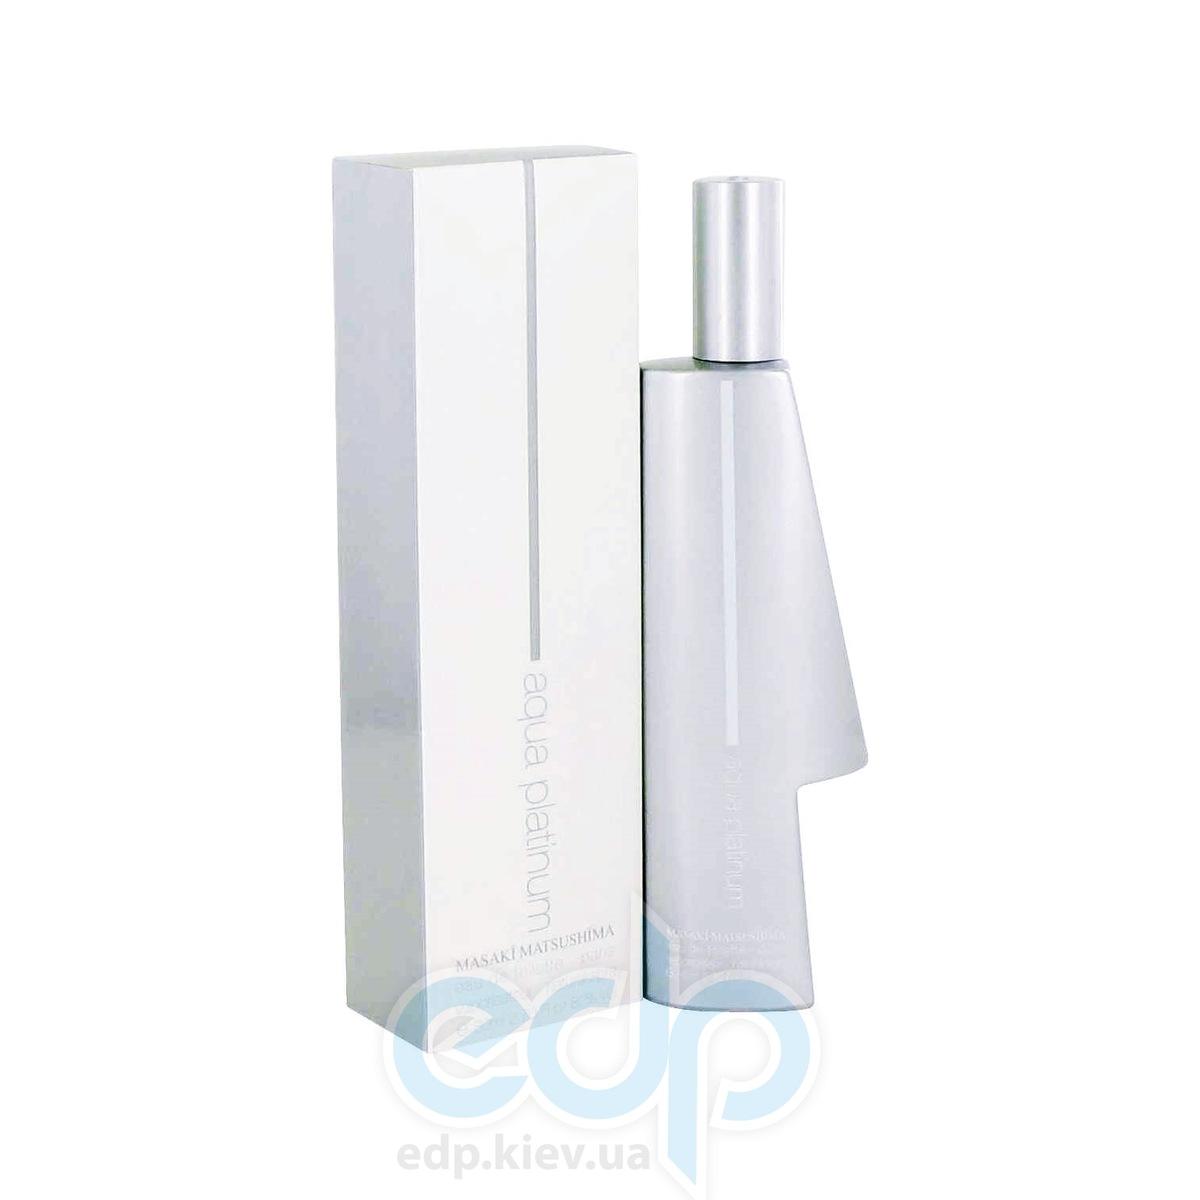 Masaki Matsushima Mat Aqua Platinum Homme - туалетная вода - 40 ml